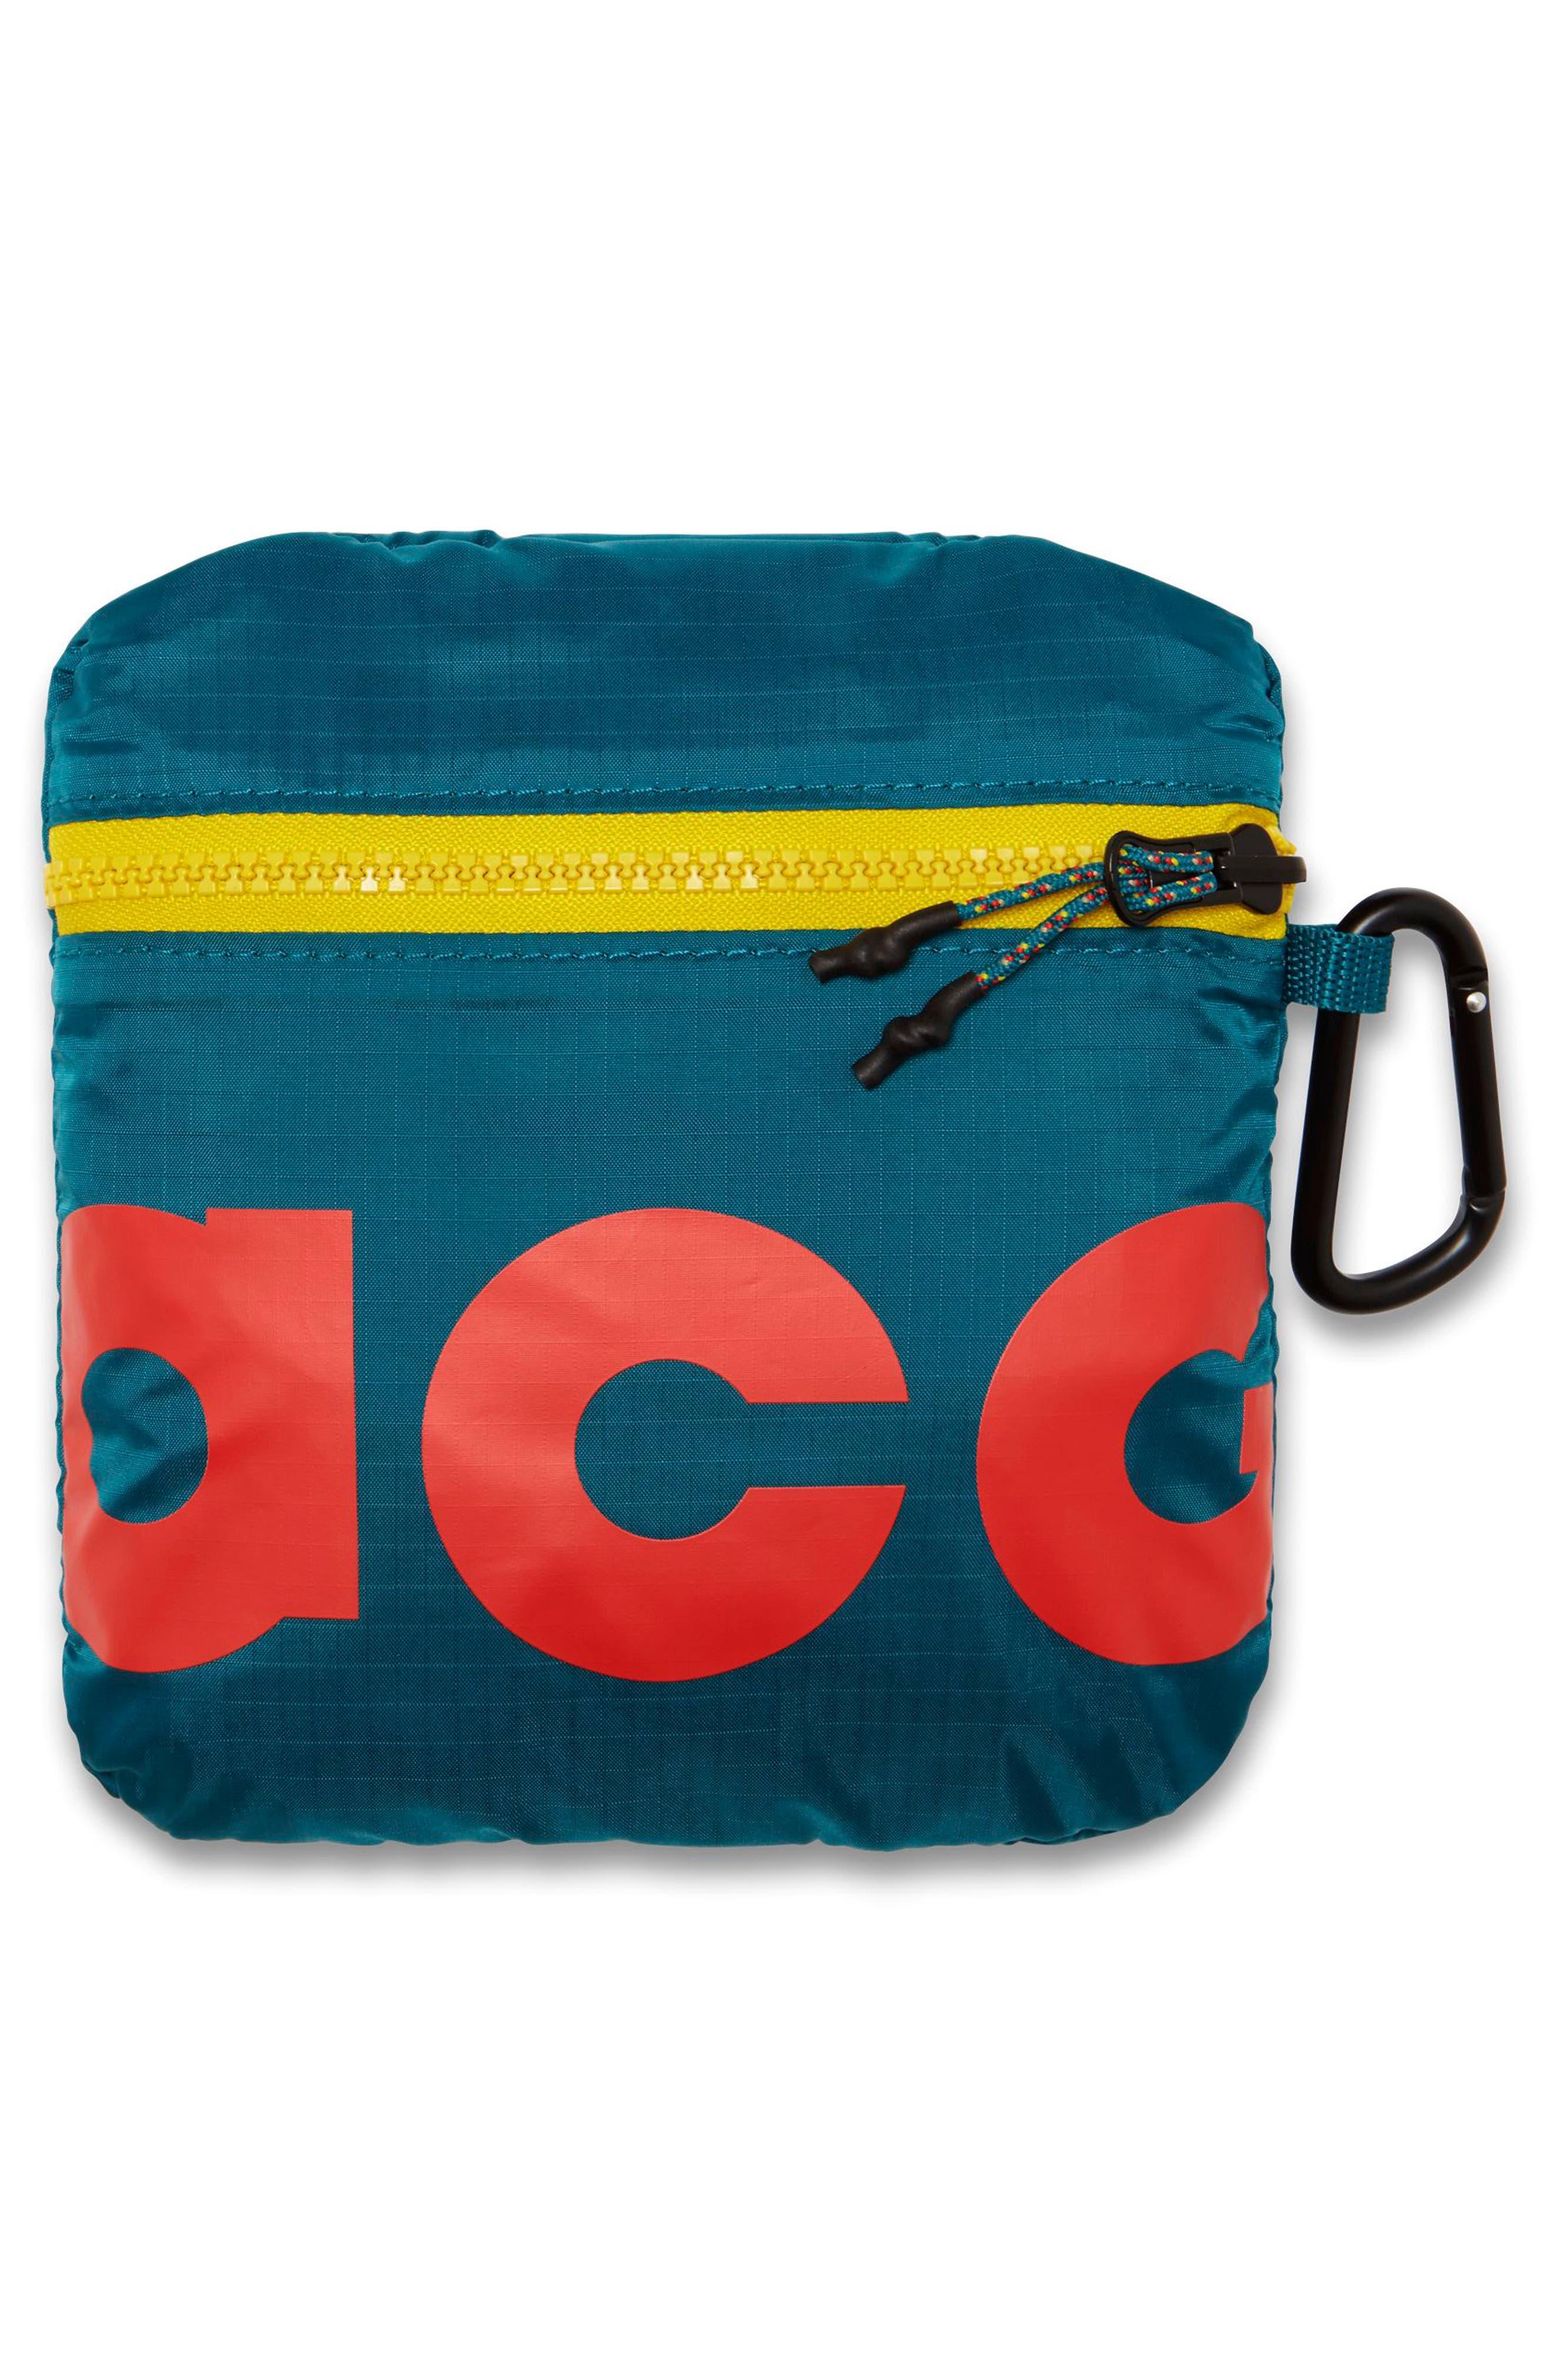 NIKE, ACG Packable Backpack, Alternate thumbnail 6, color, GEODE TEAL/ GEODE TEAL